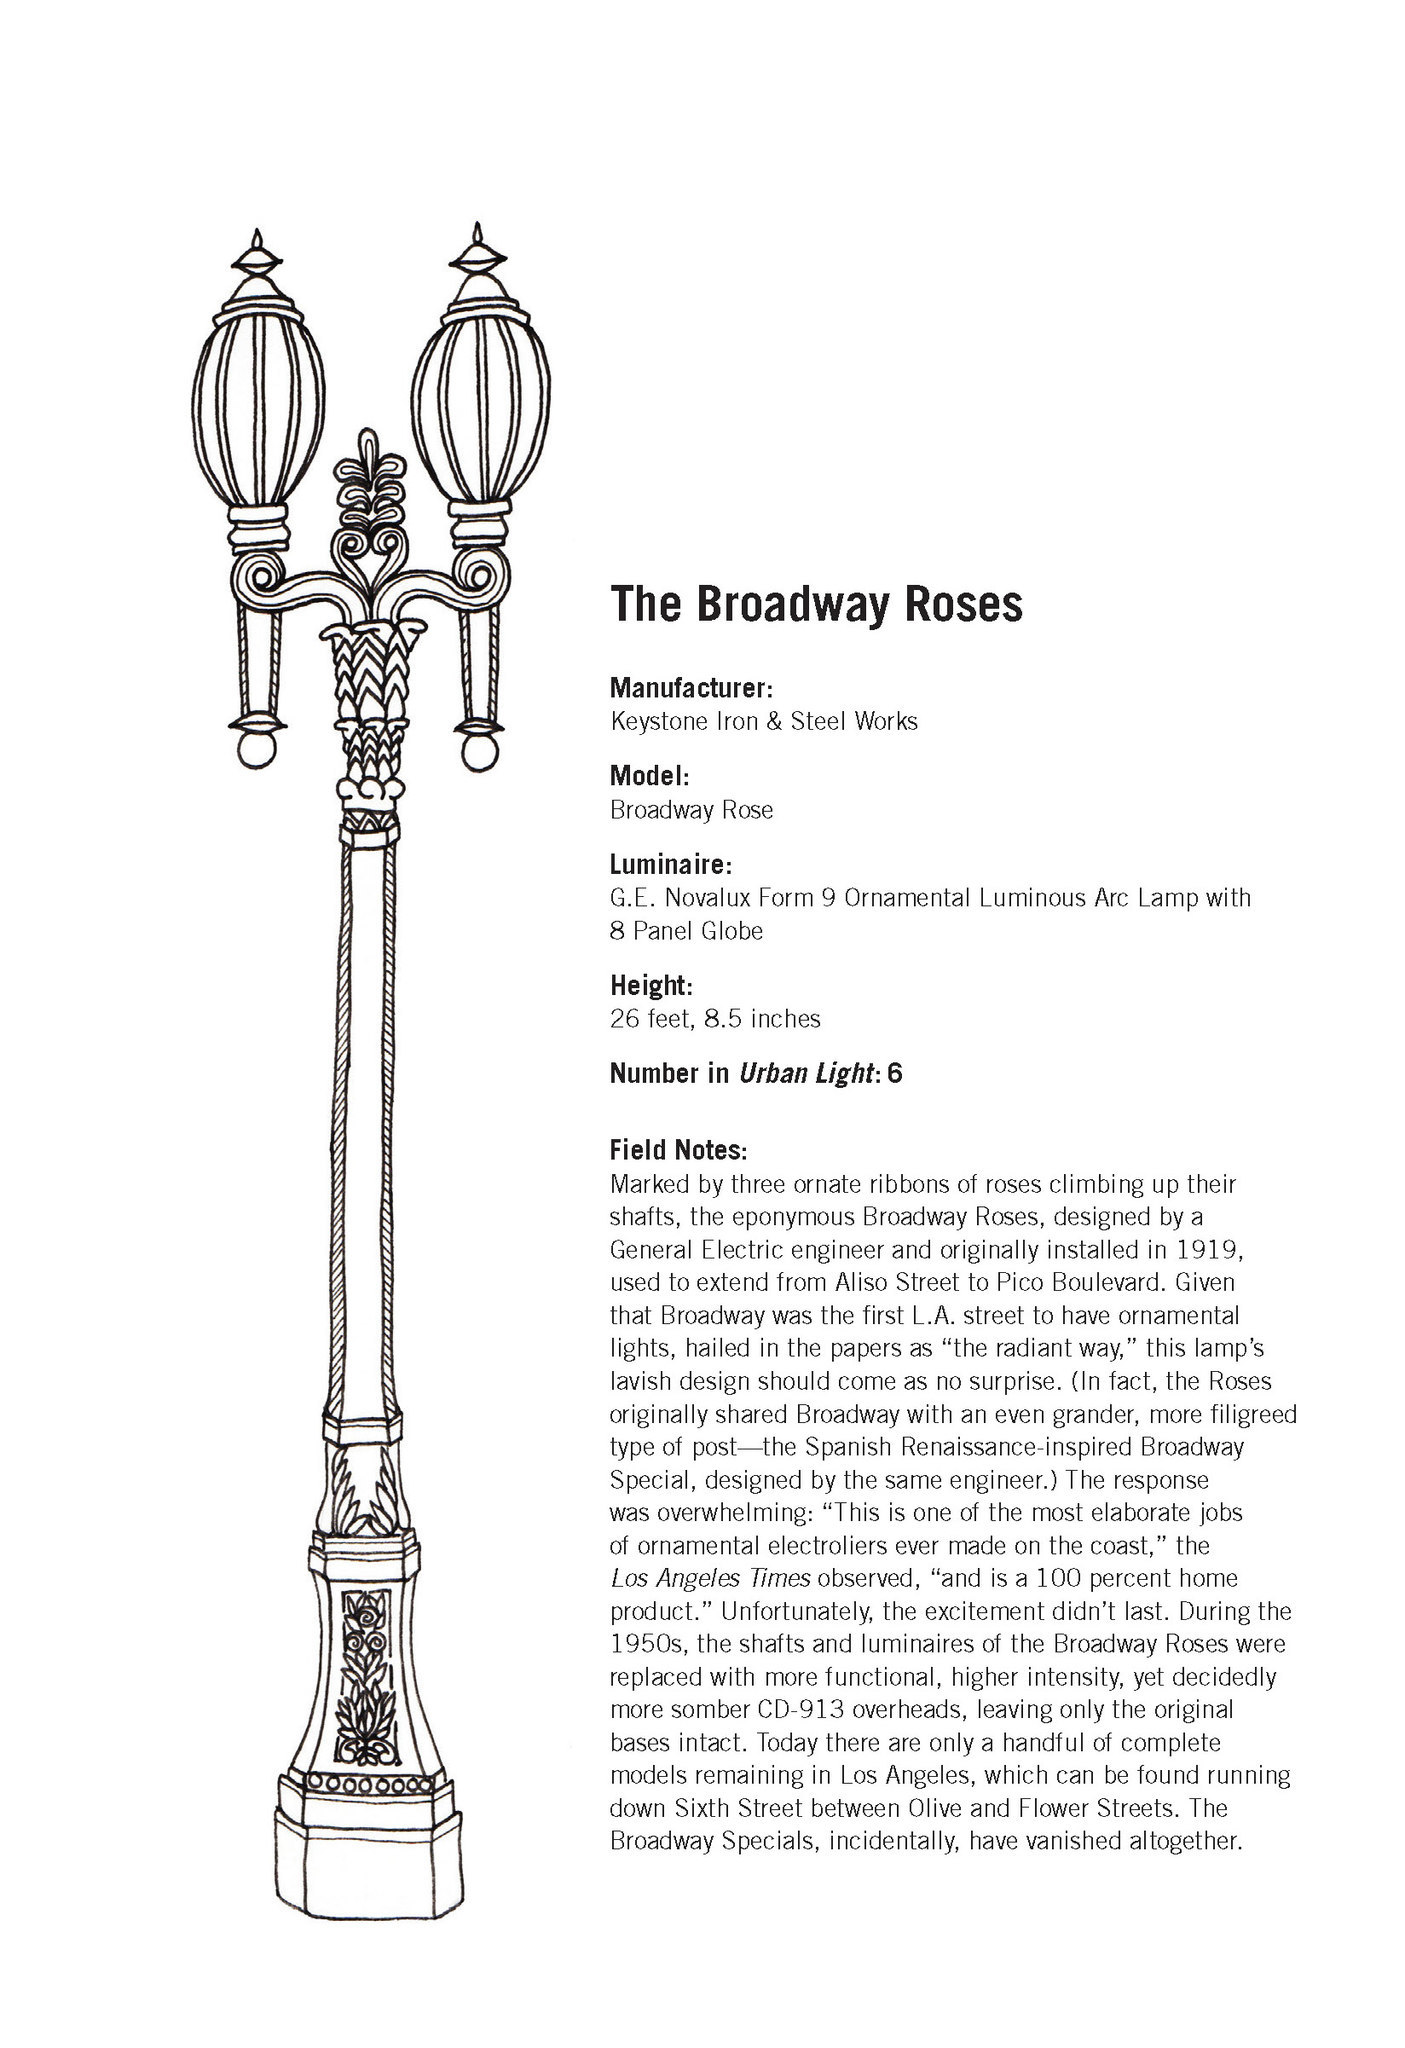 The Broadway Rose street lamp was one of Chris Burden's favorites.